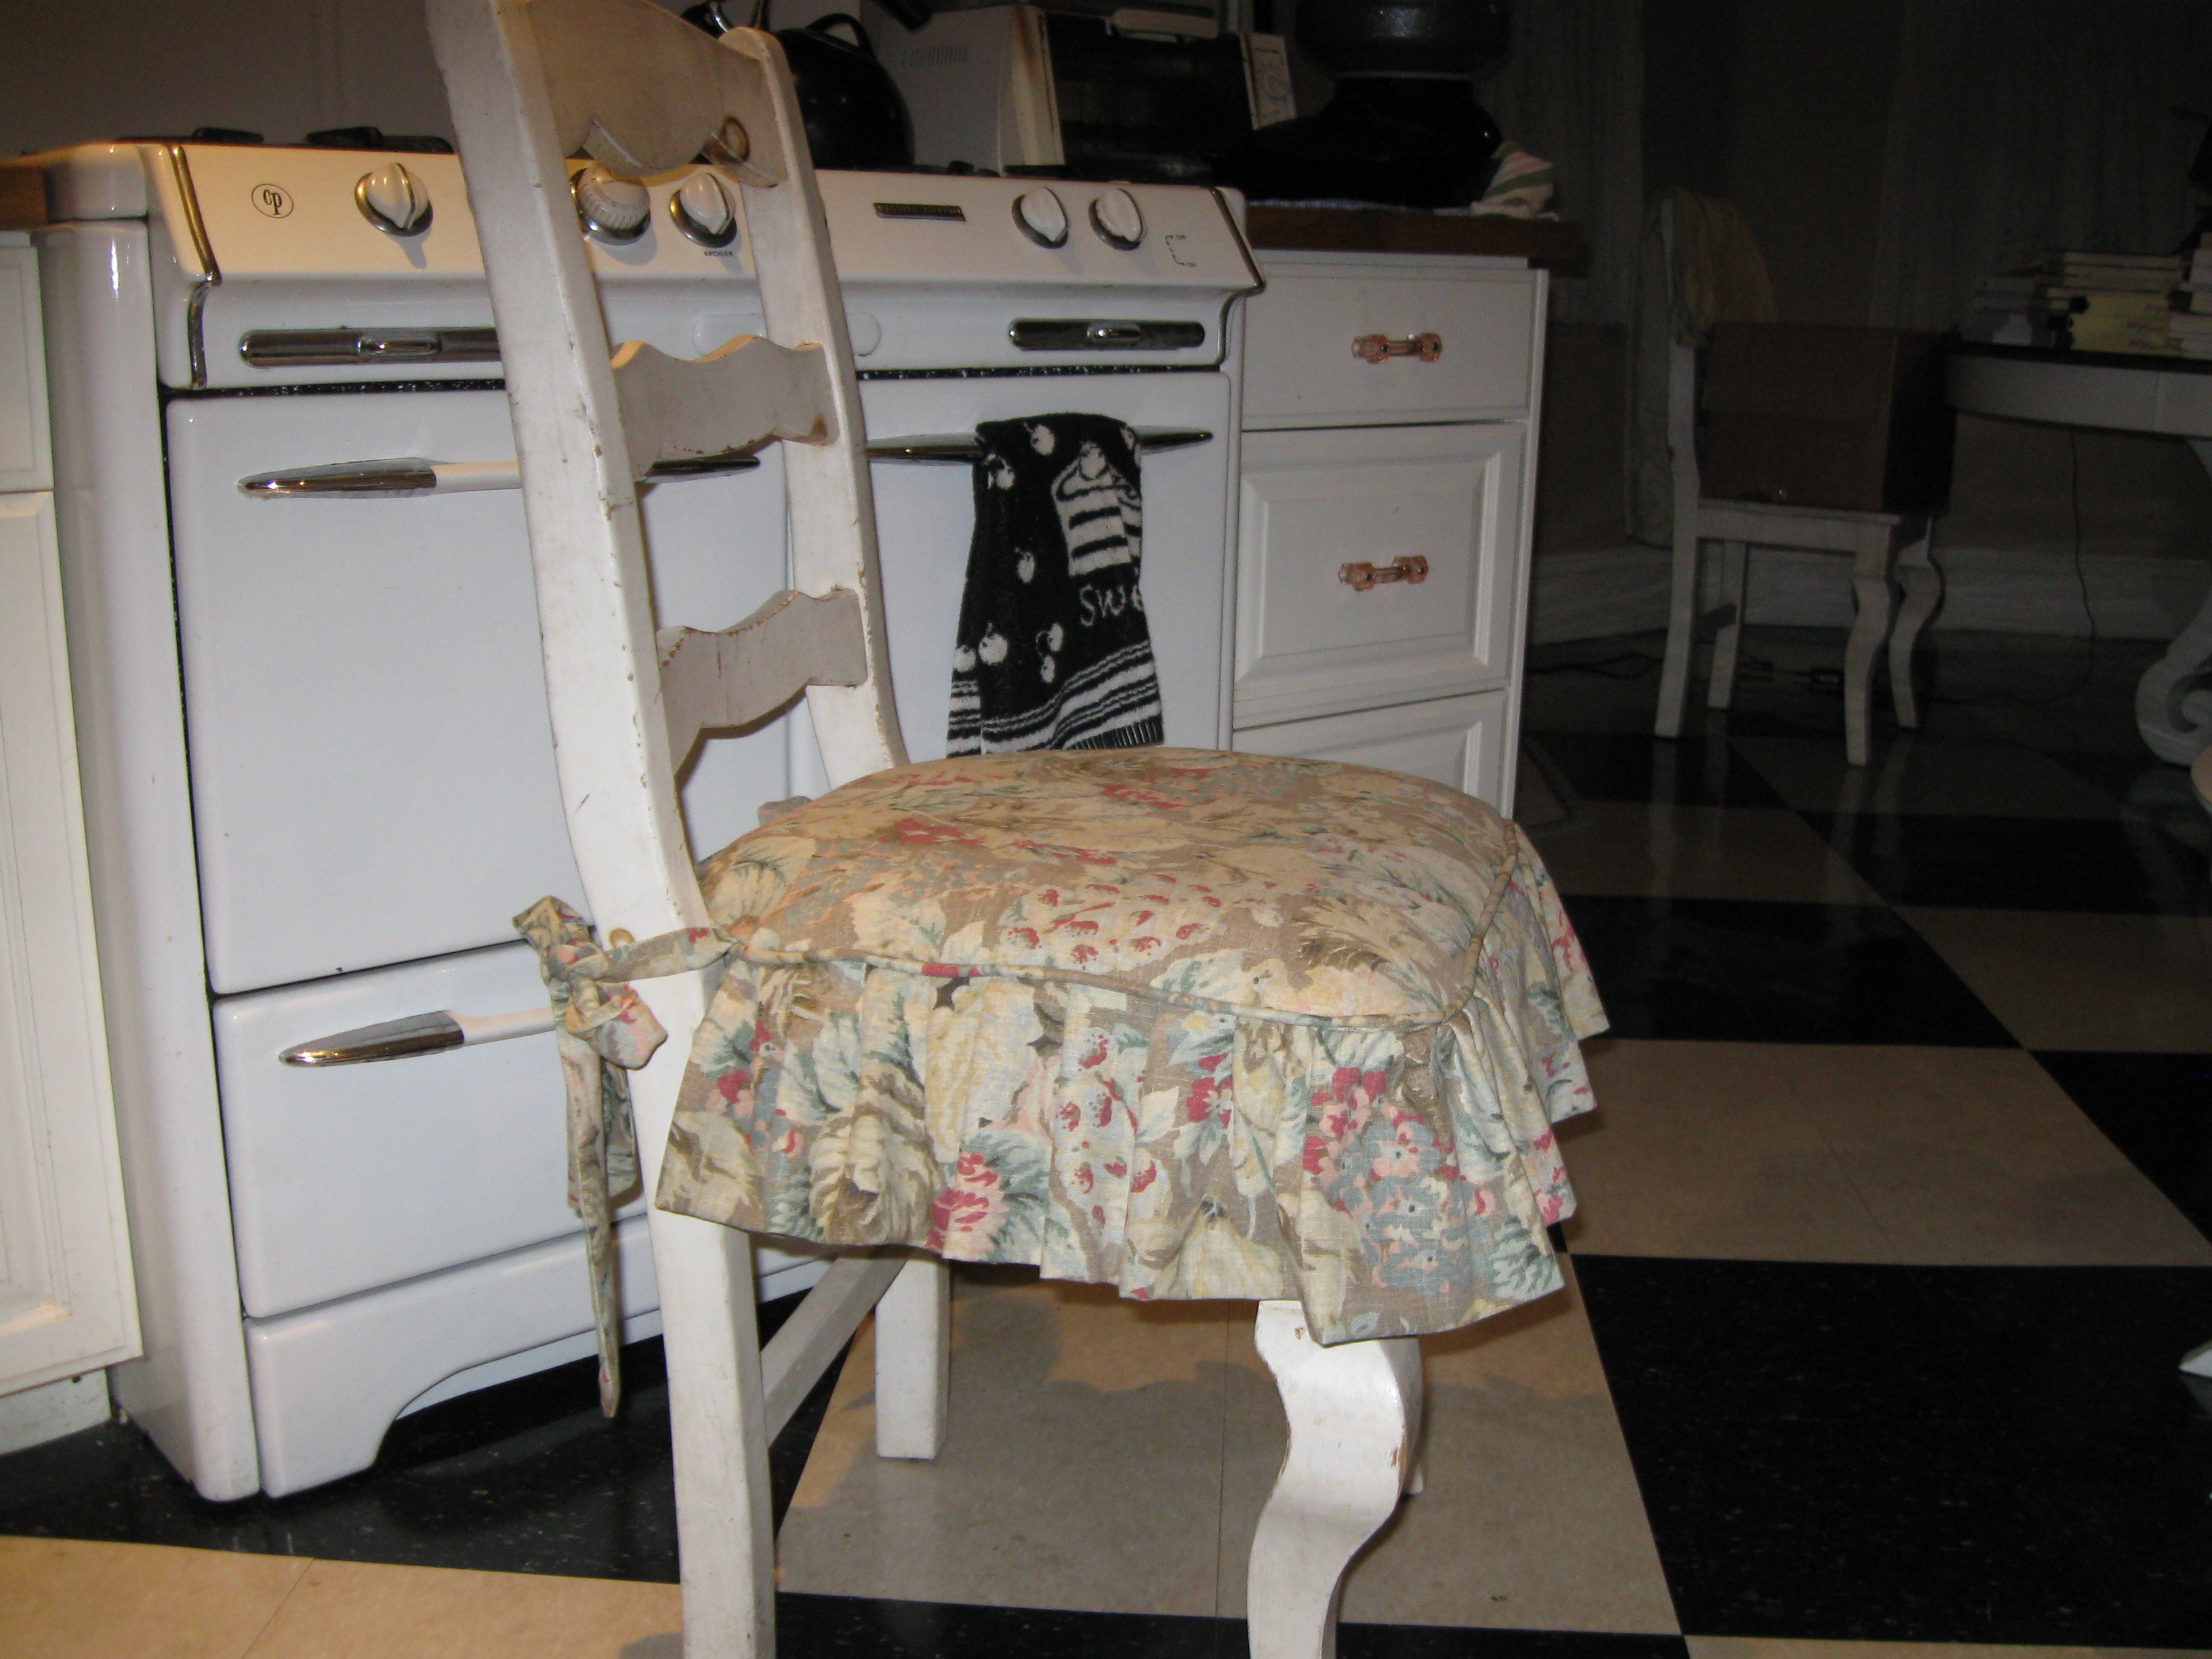 Kitchen chair pillows Photo - 1